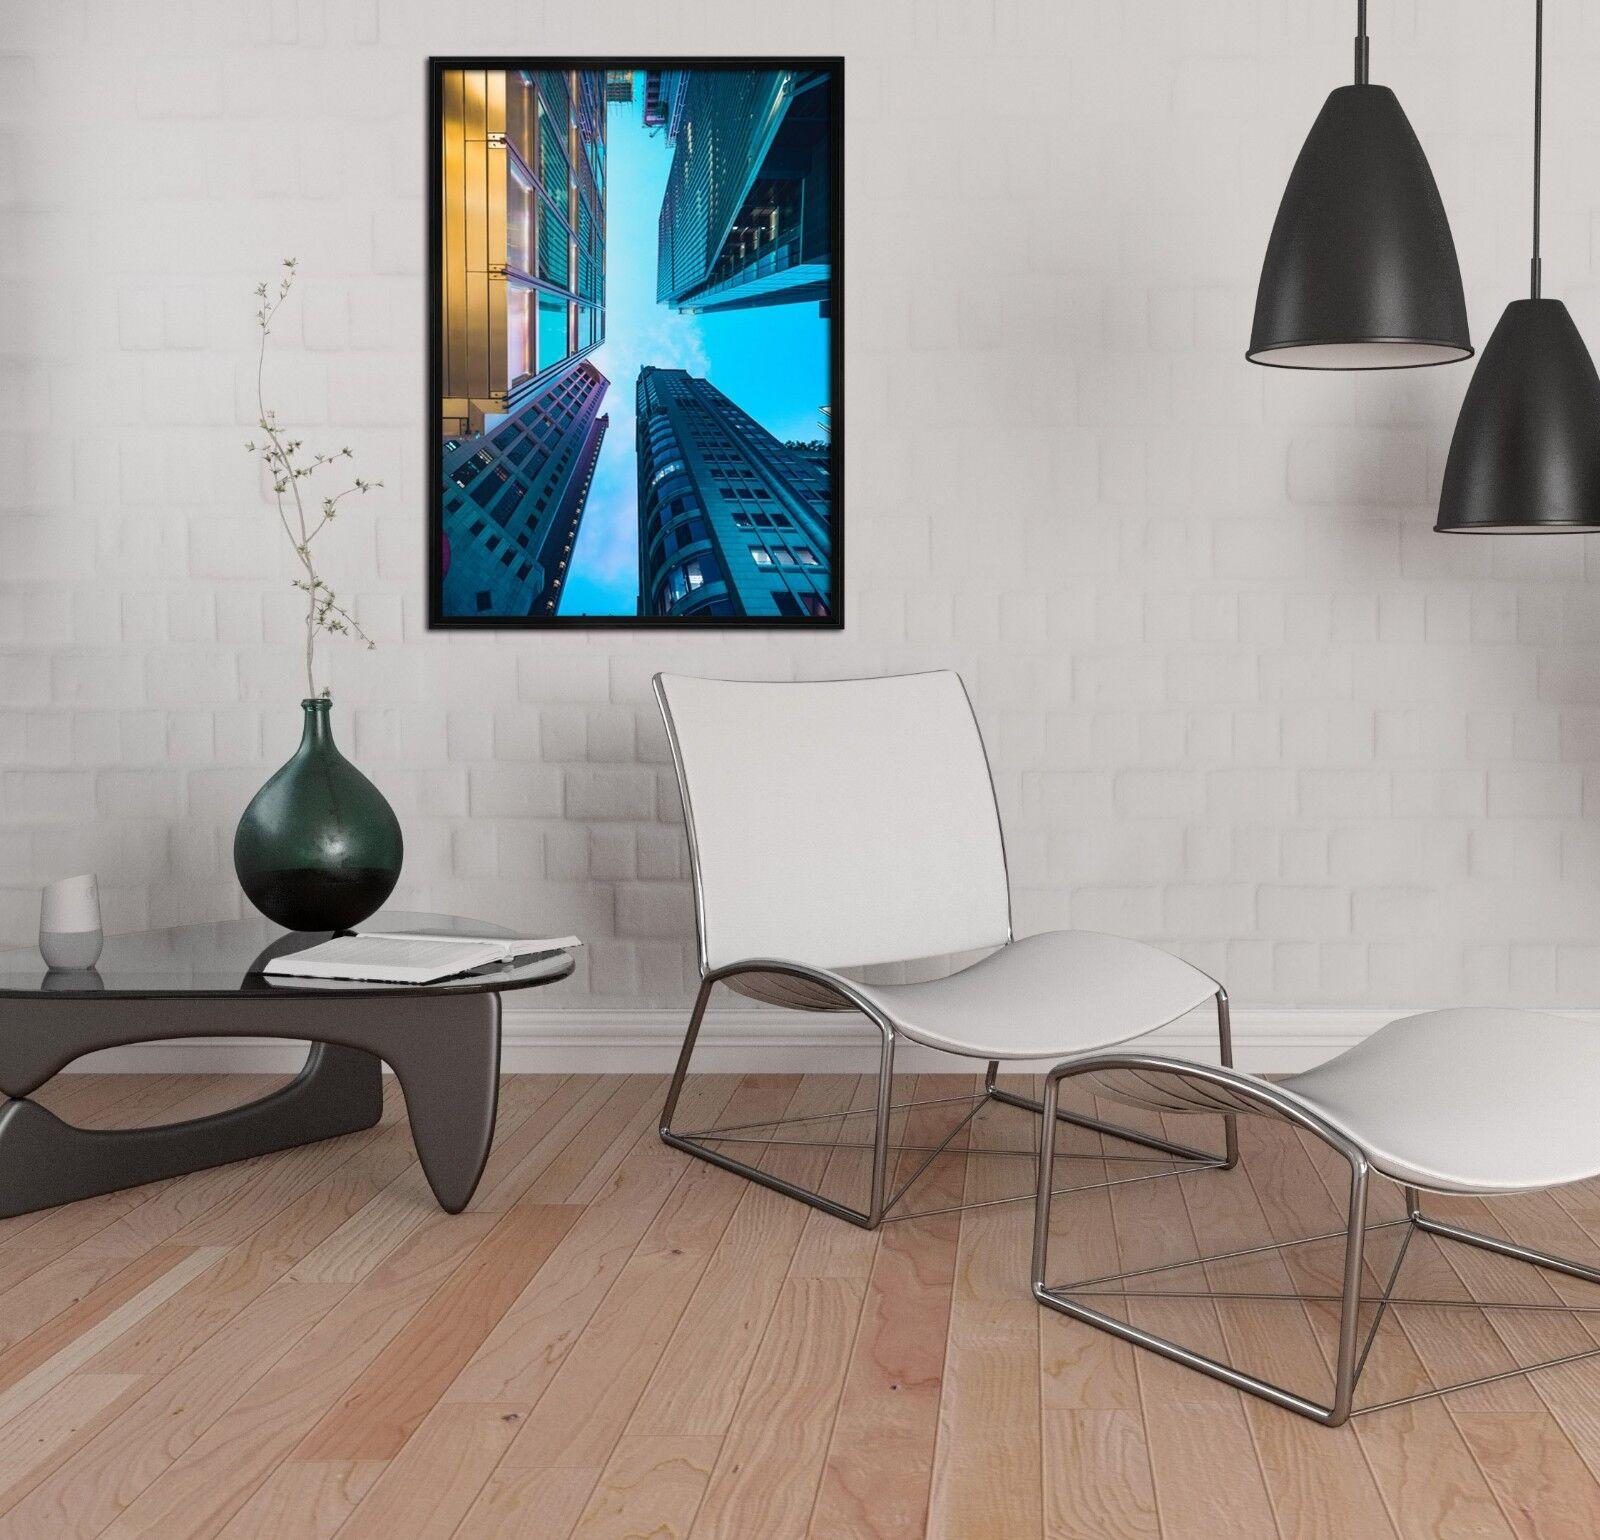 3D Blau Building 47 Framed Poster Home Decor Print Painting Art AJ UK